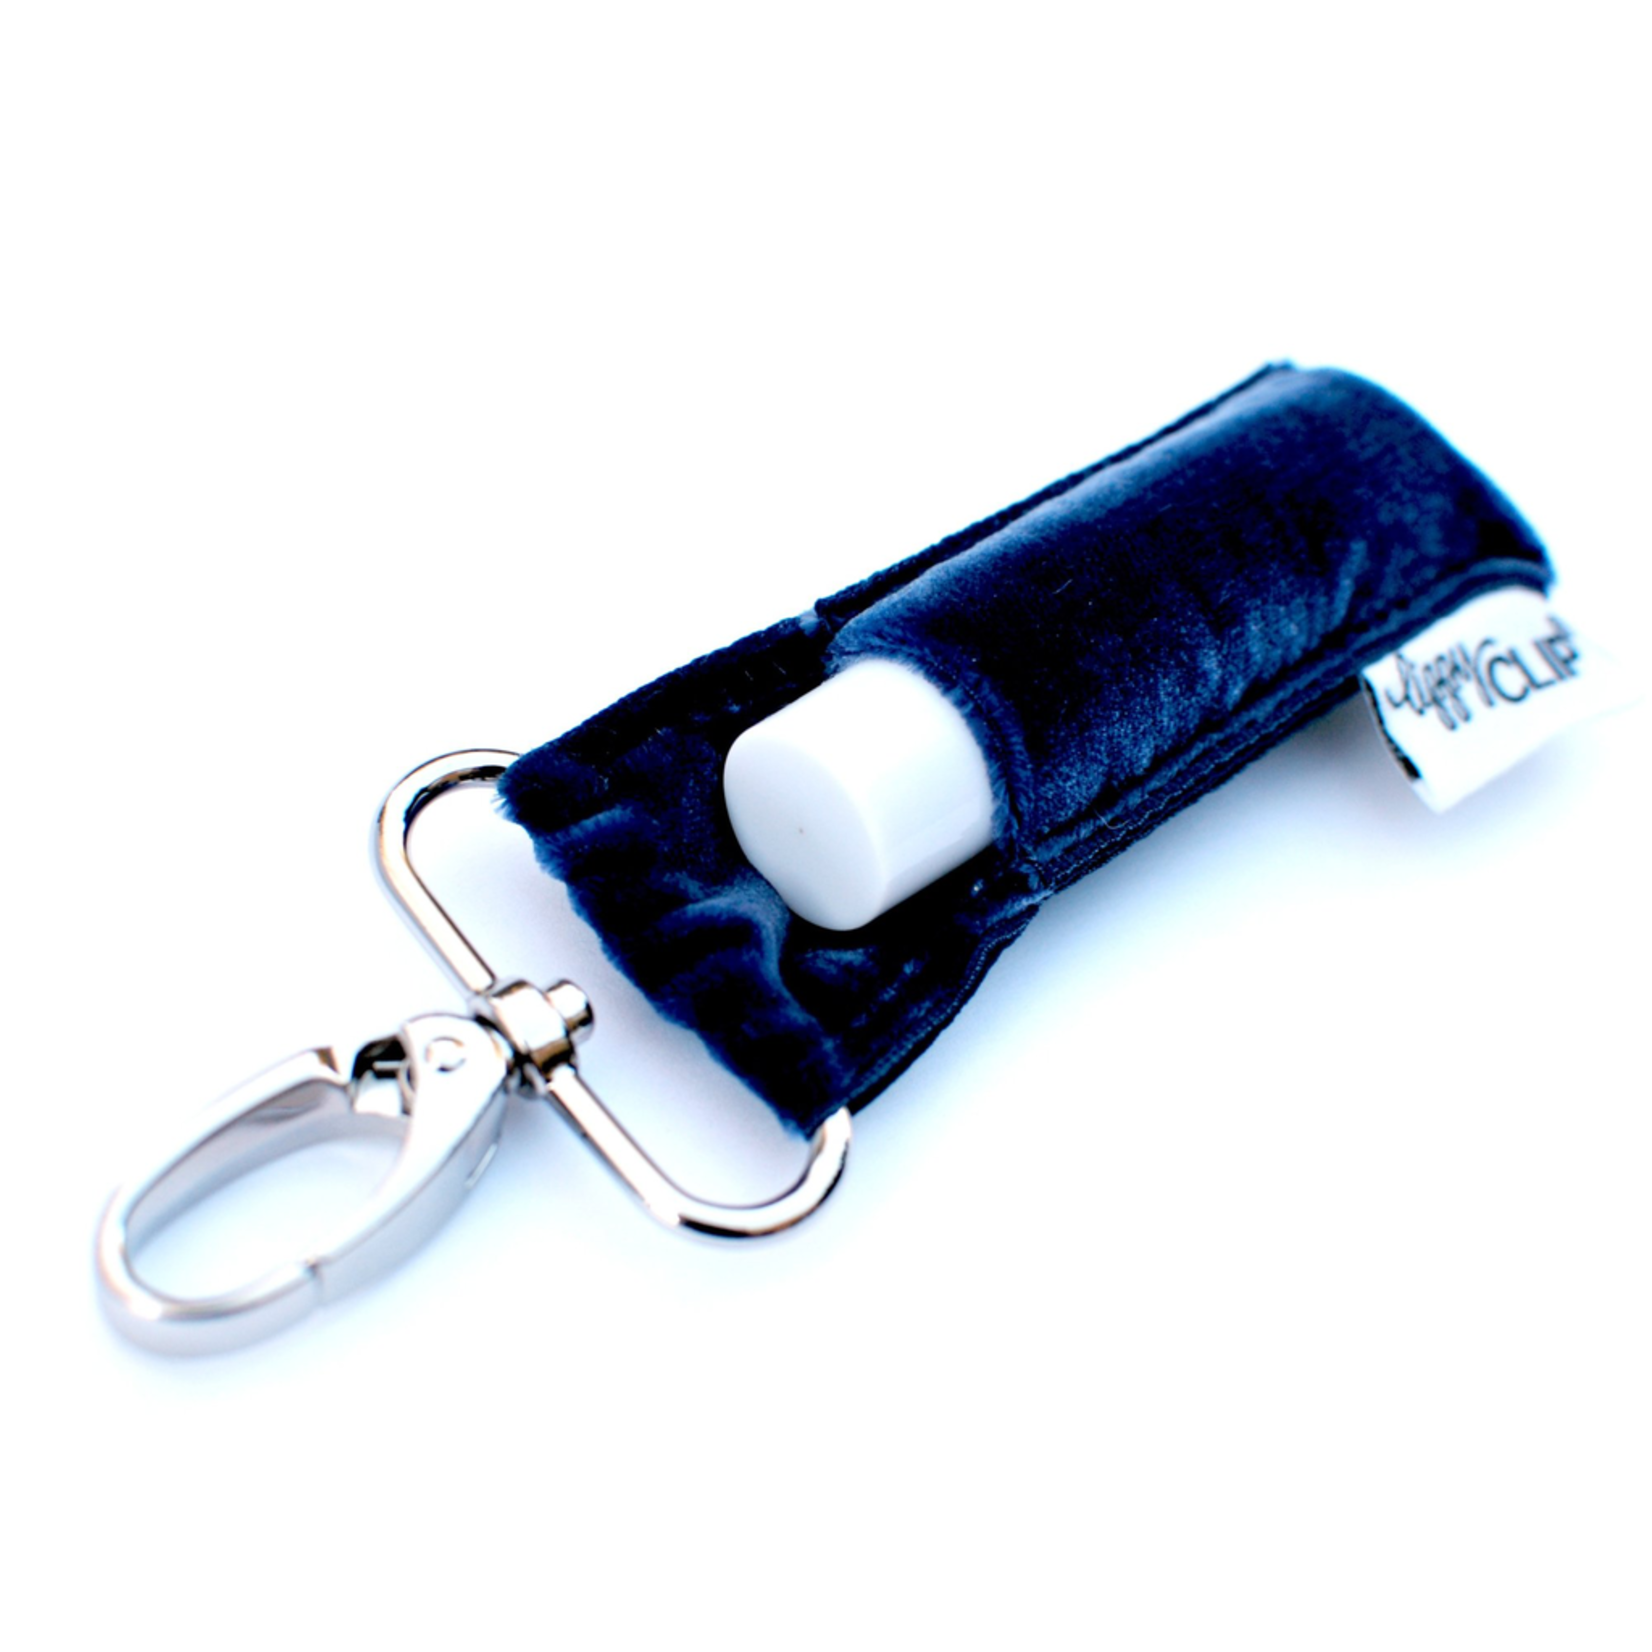 LippyClip Navy Velvet lip balm holder